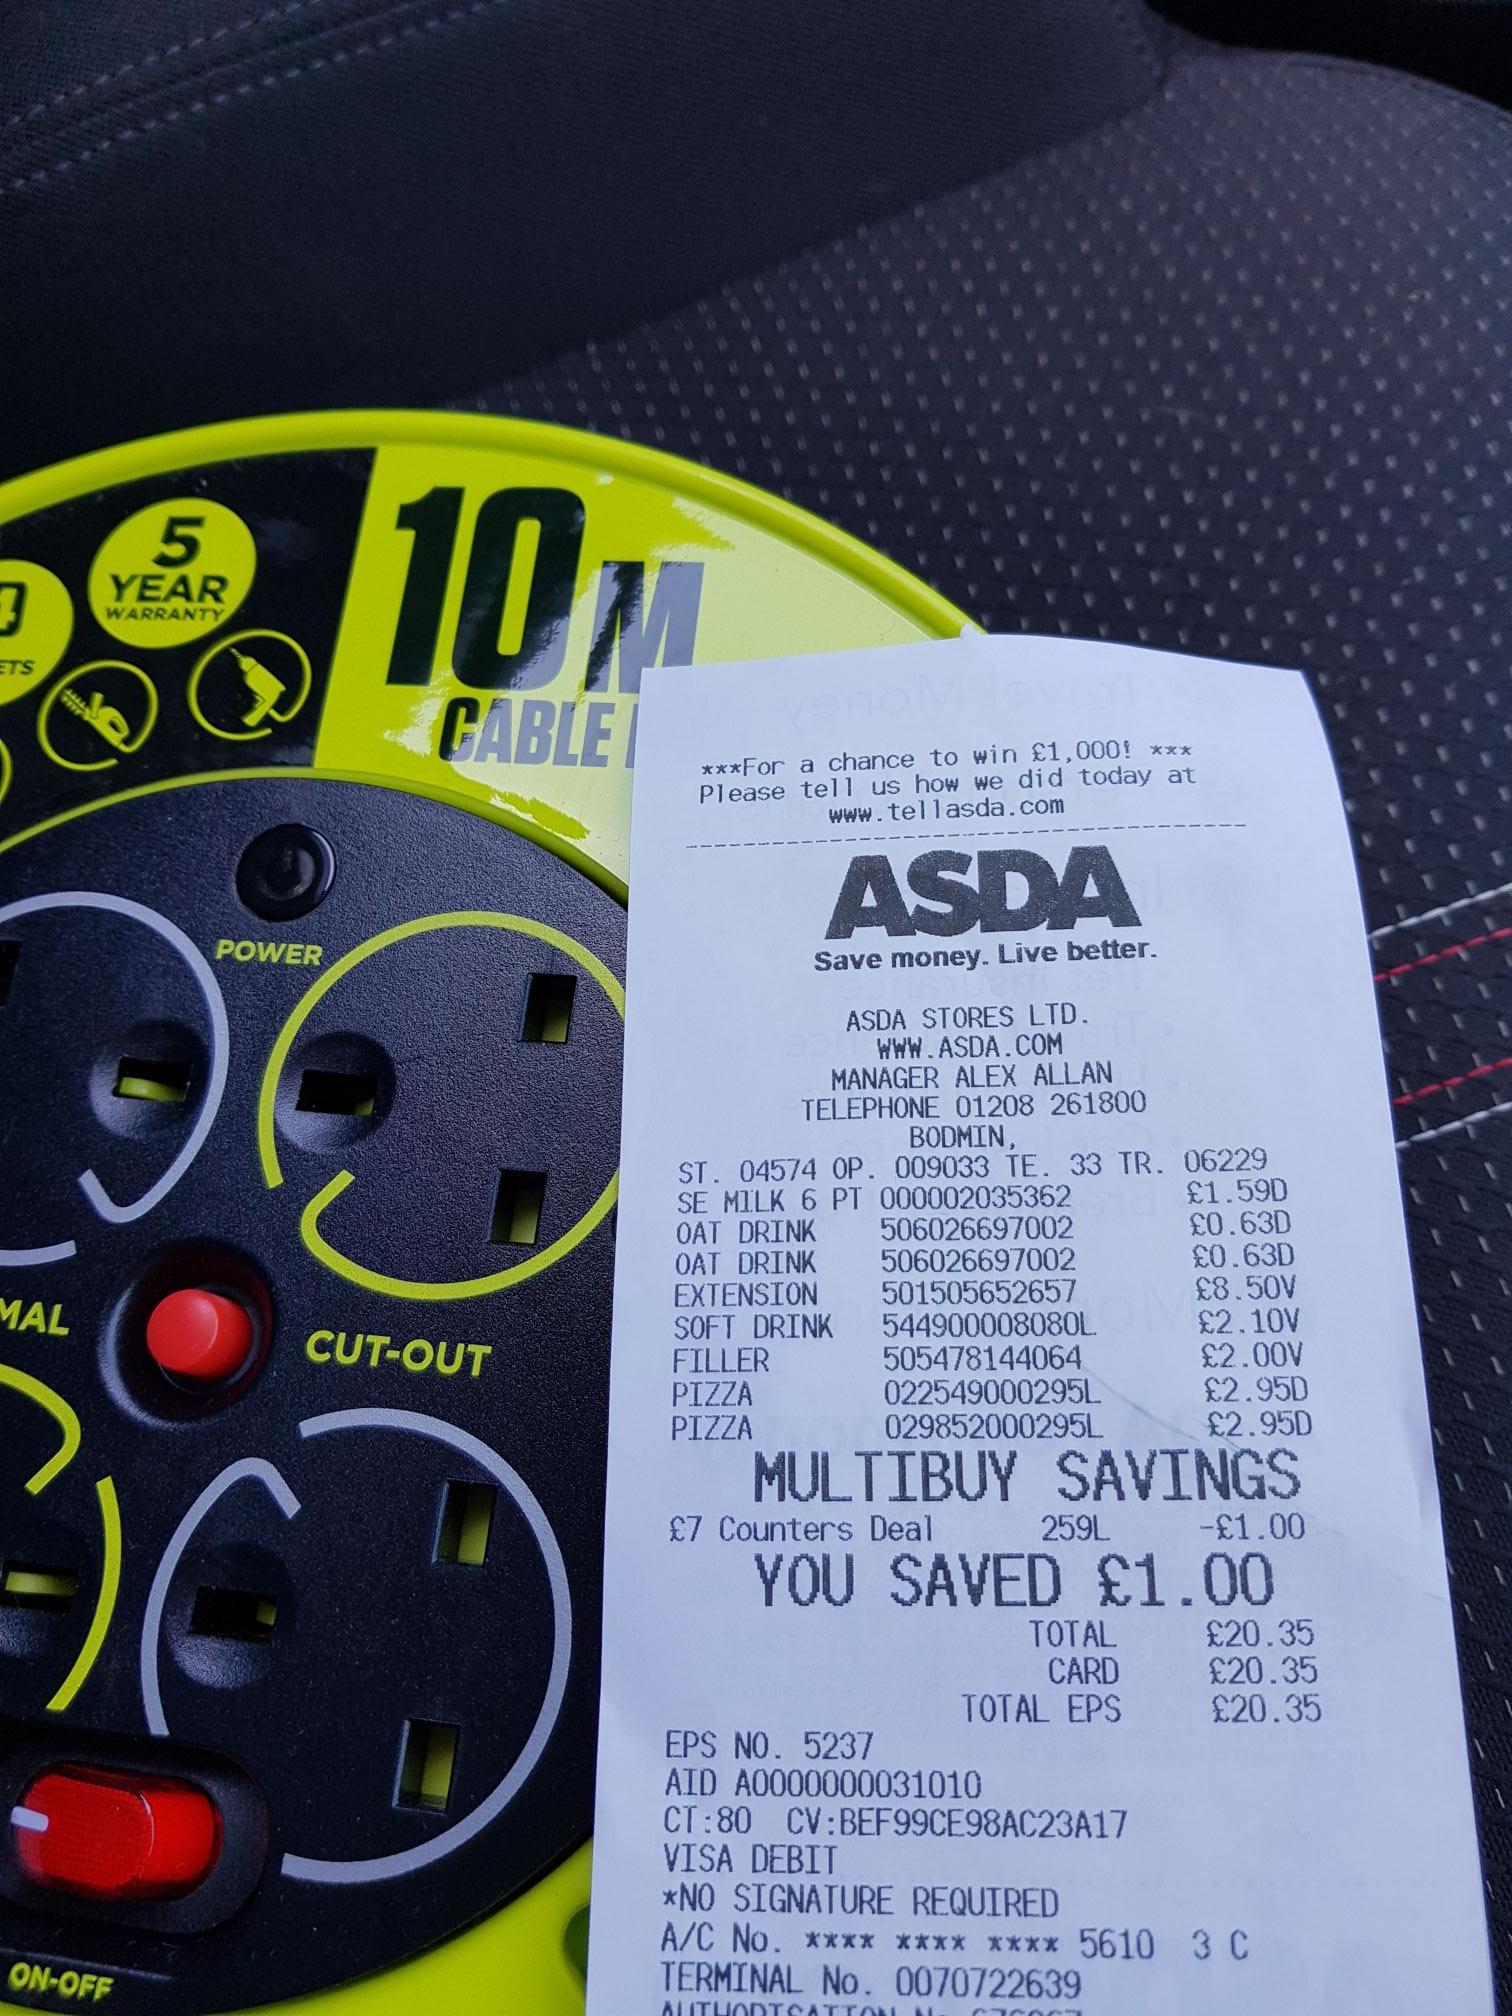 10m cable reel extension £8.50 at Asda Bodmin